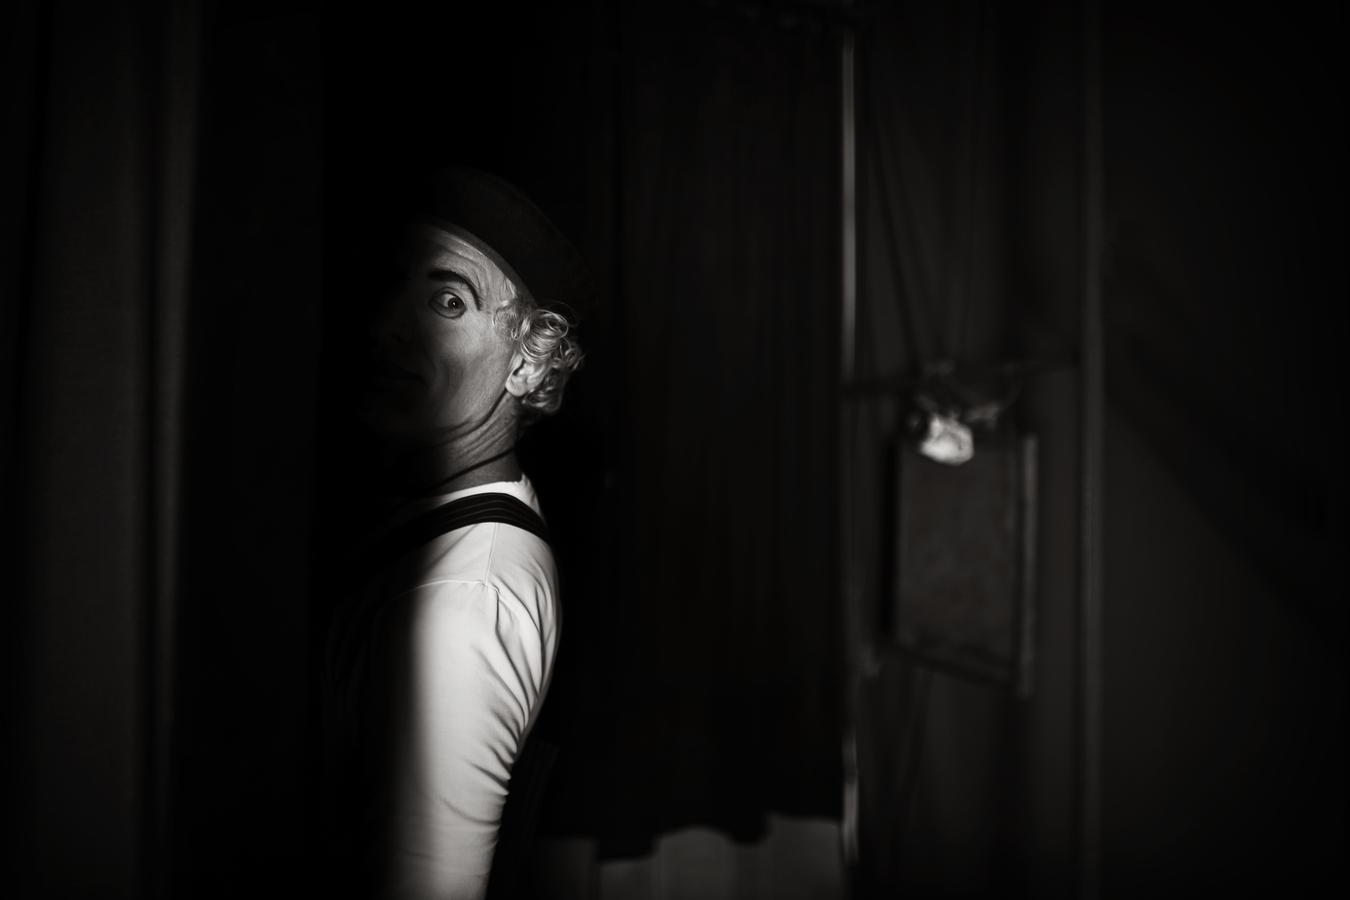 HUMBERTO 2017 I.I aneb černobílý život klauna...